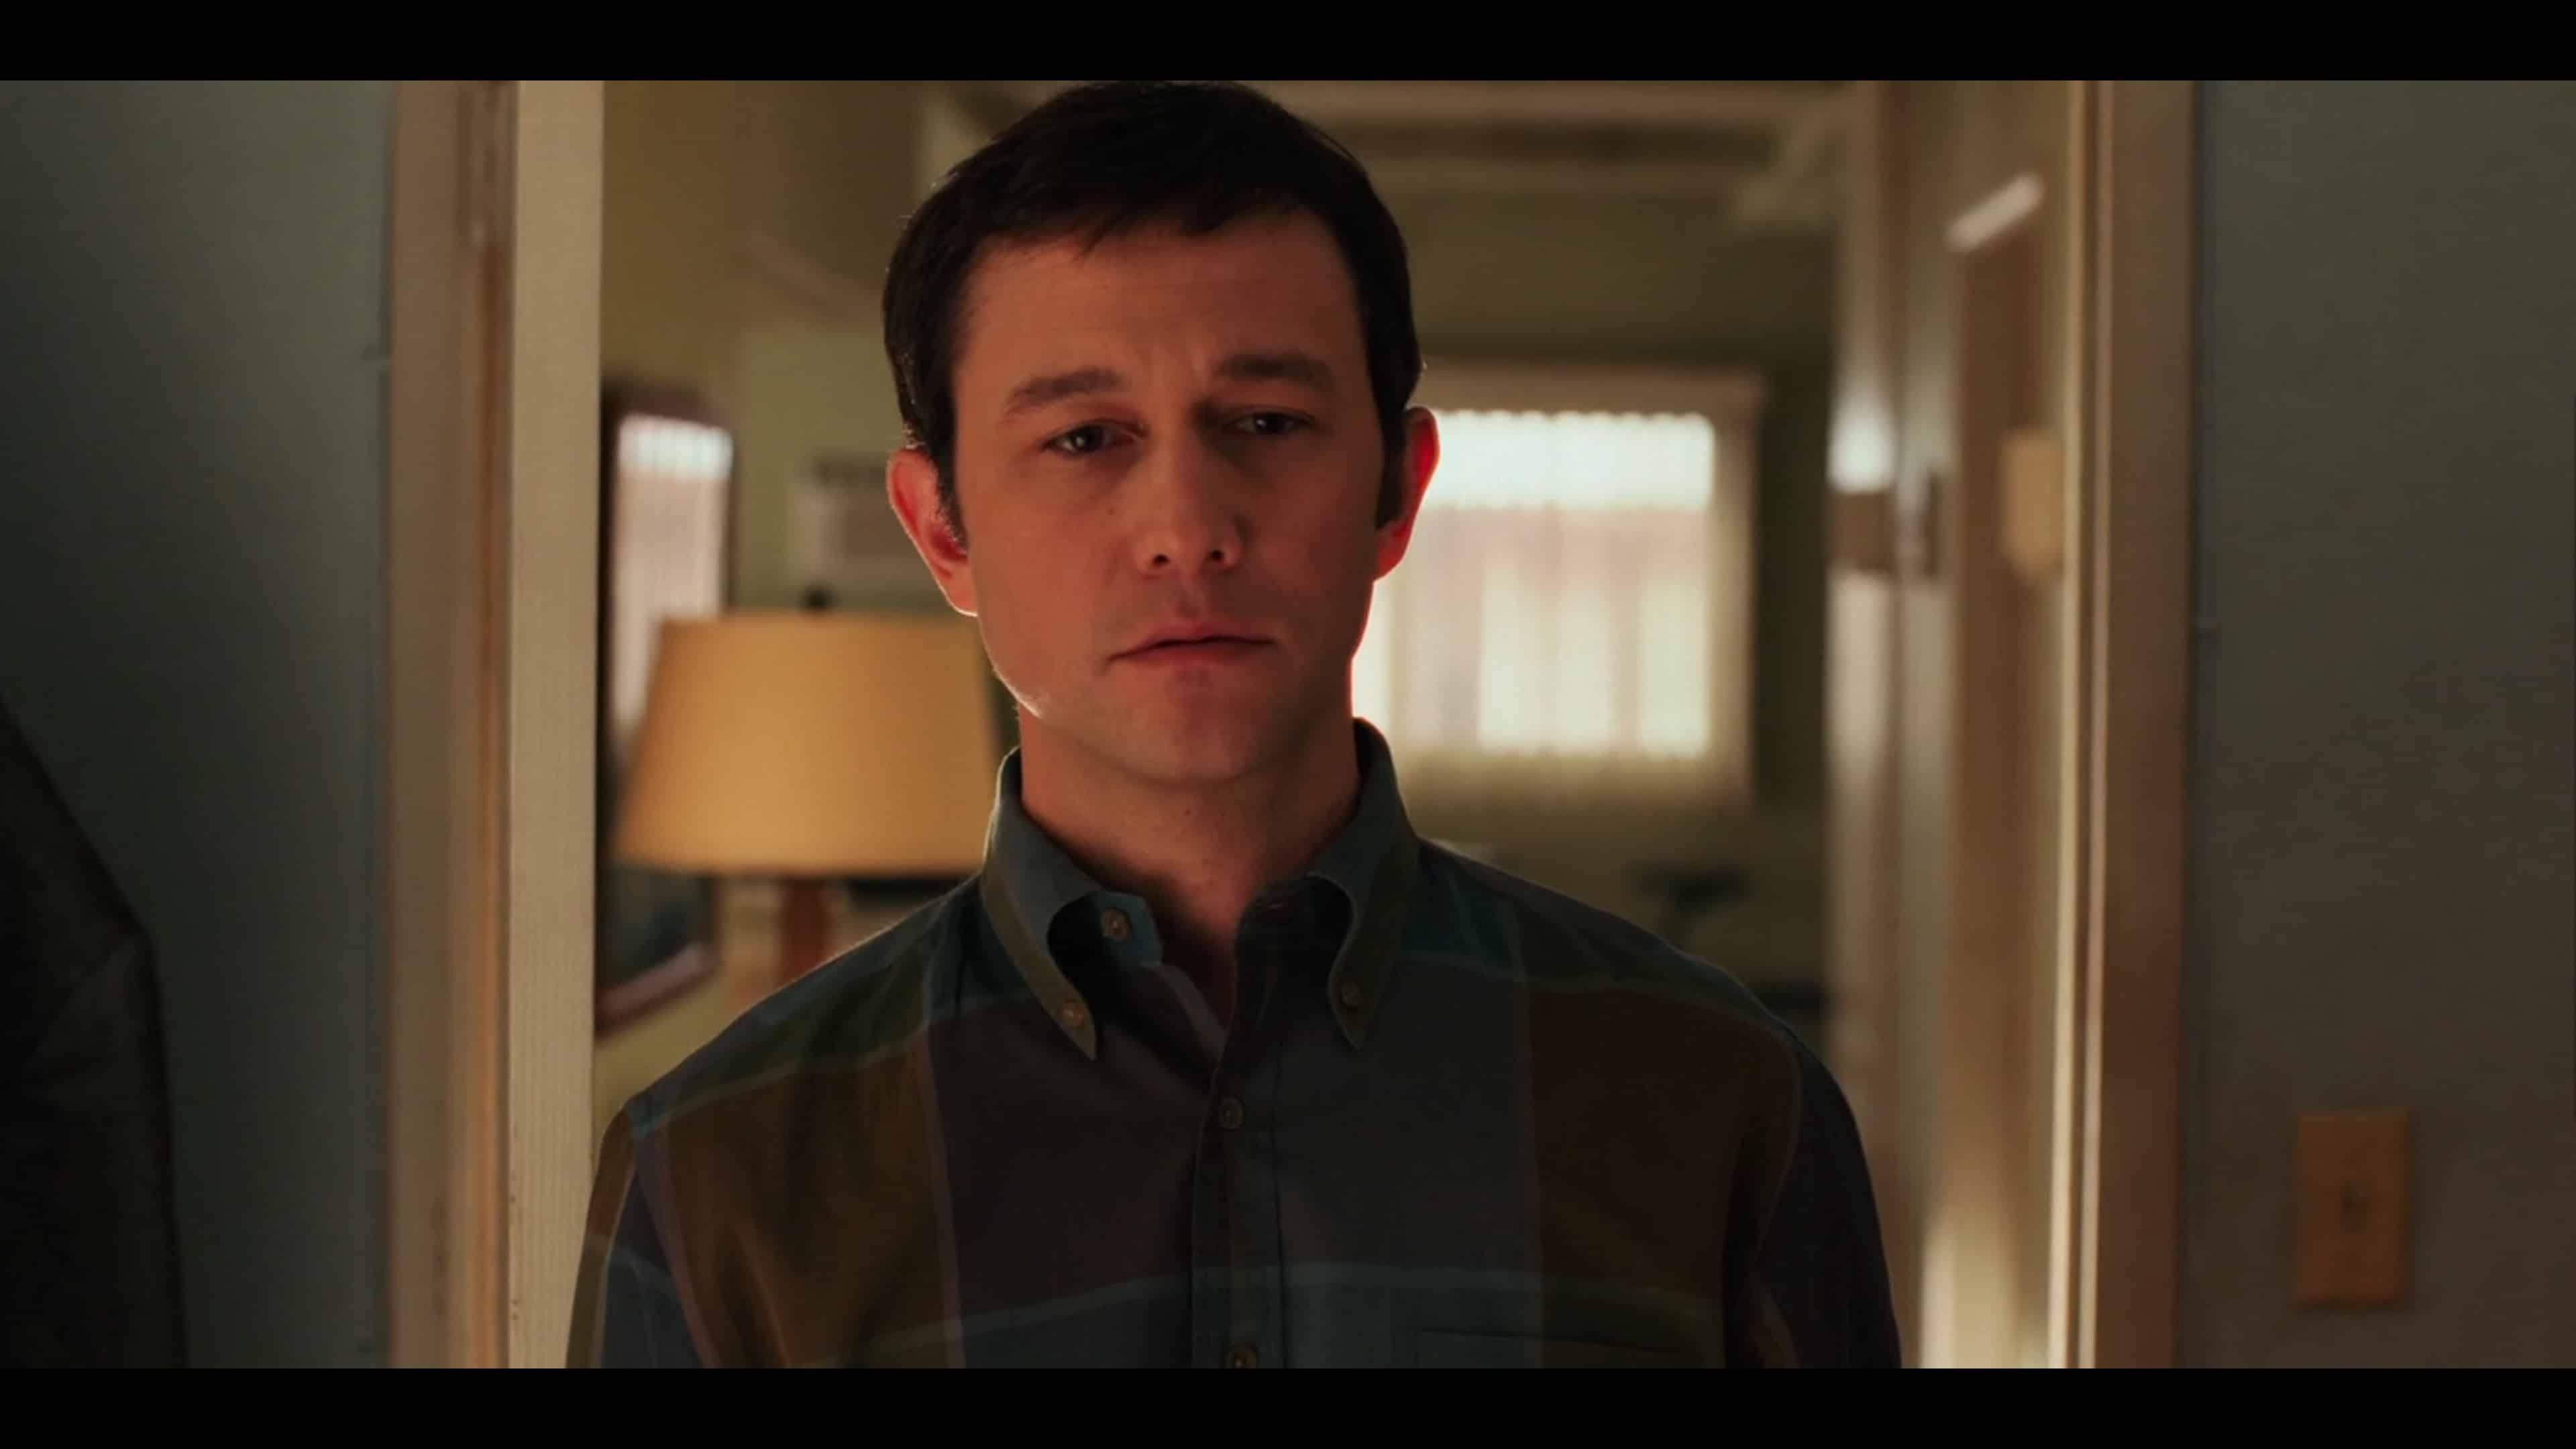 Josh (Joseph Gordon-Levitt) looking at his musical instruments